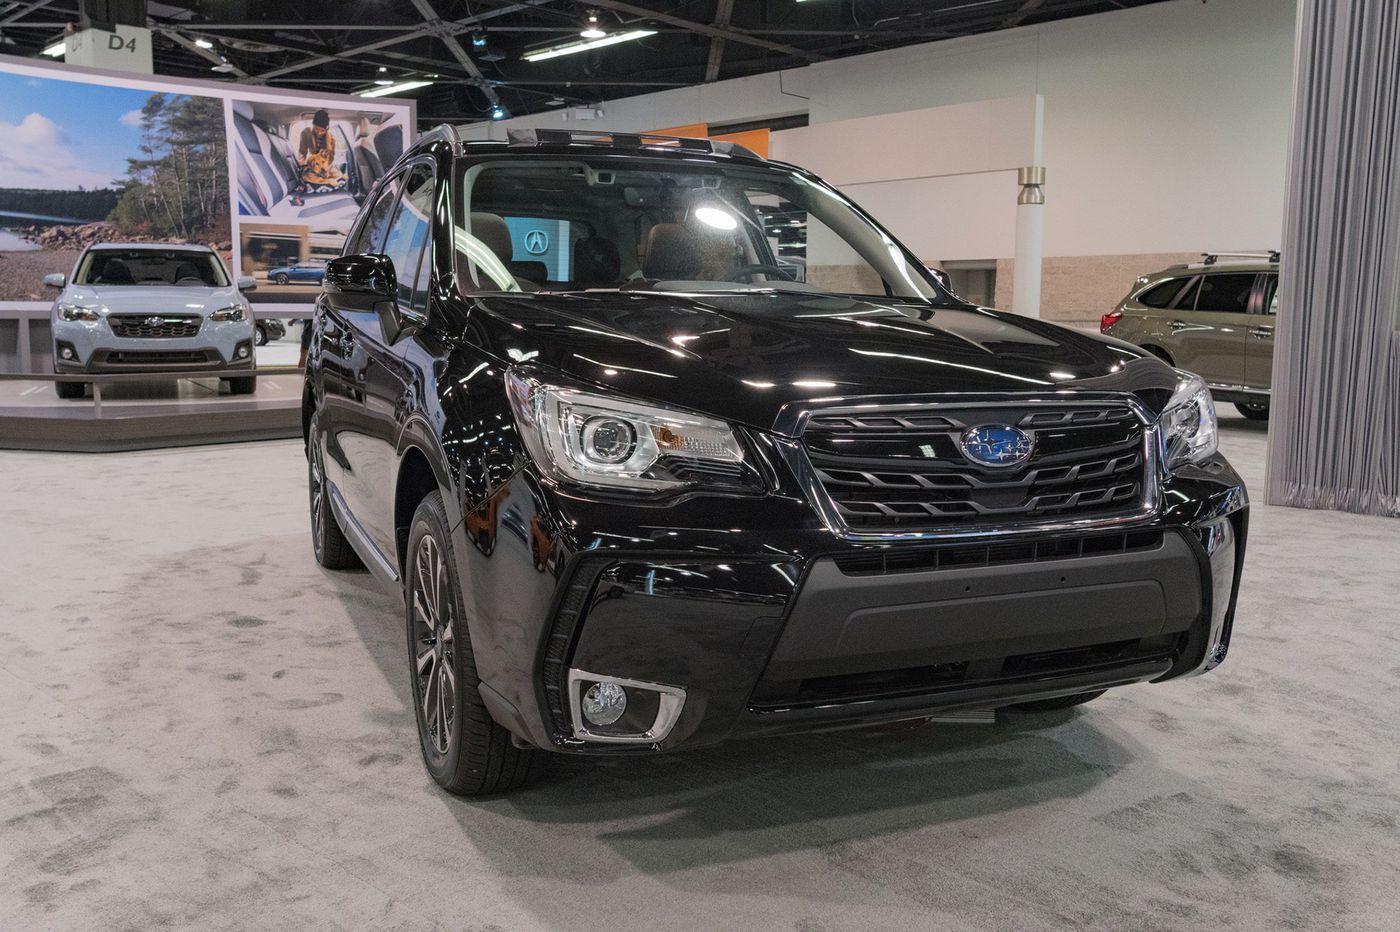 Motormouth: Subaru dealer might sort out battery problem